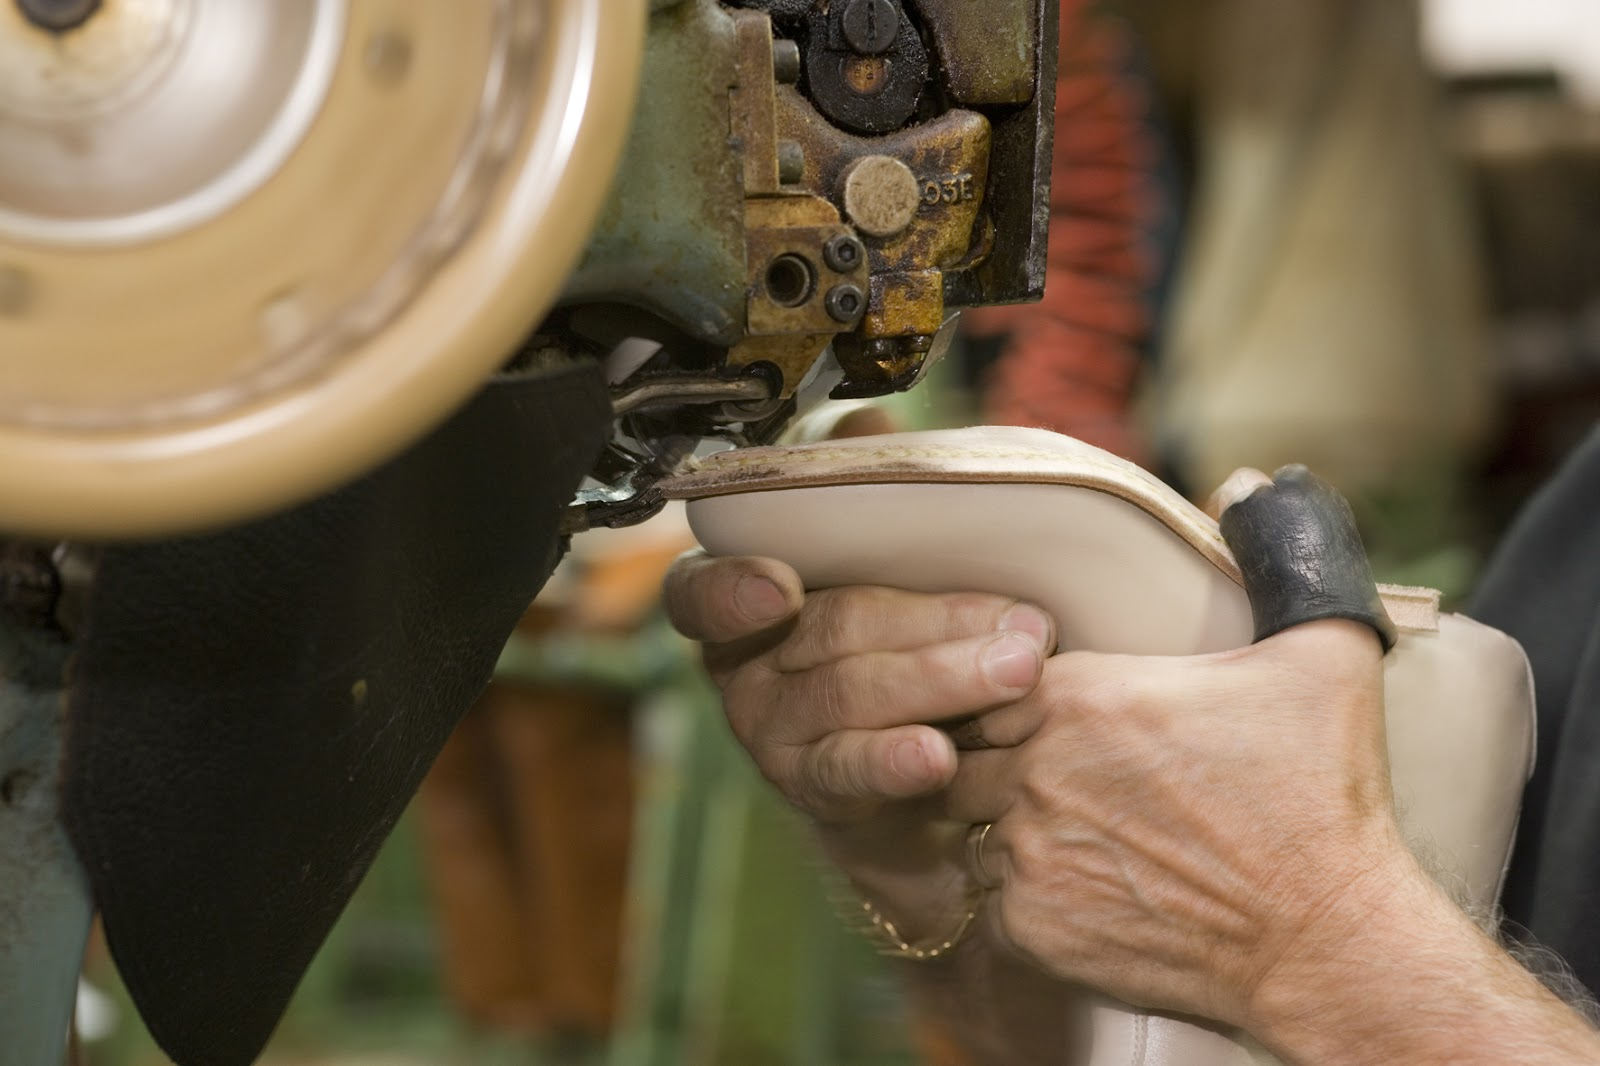 Sistema Goodyear botas cowboy Tony Mora Boots